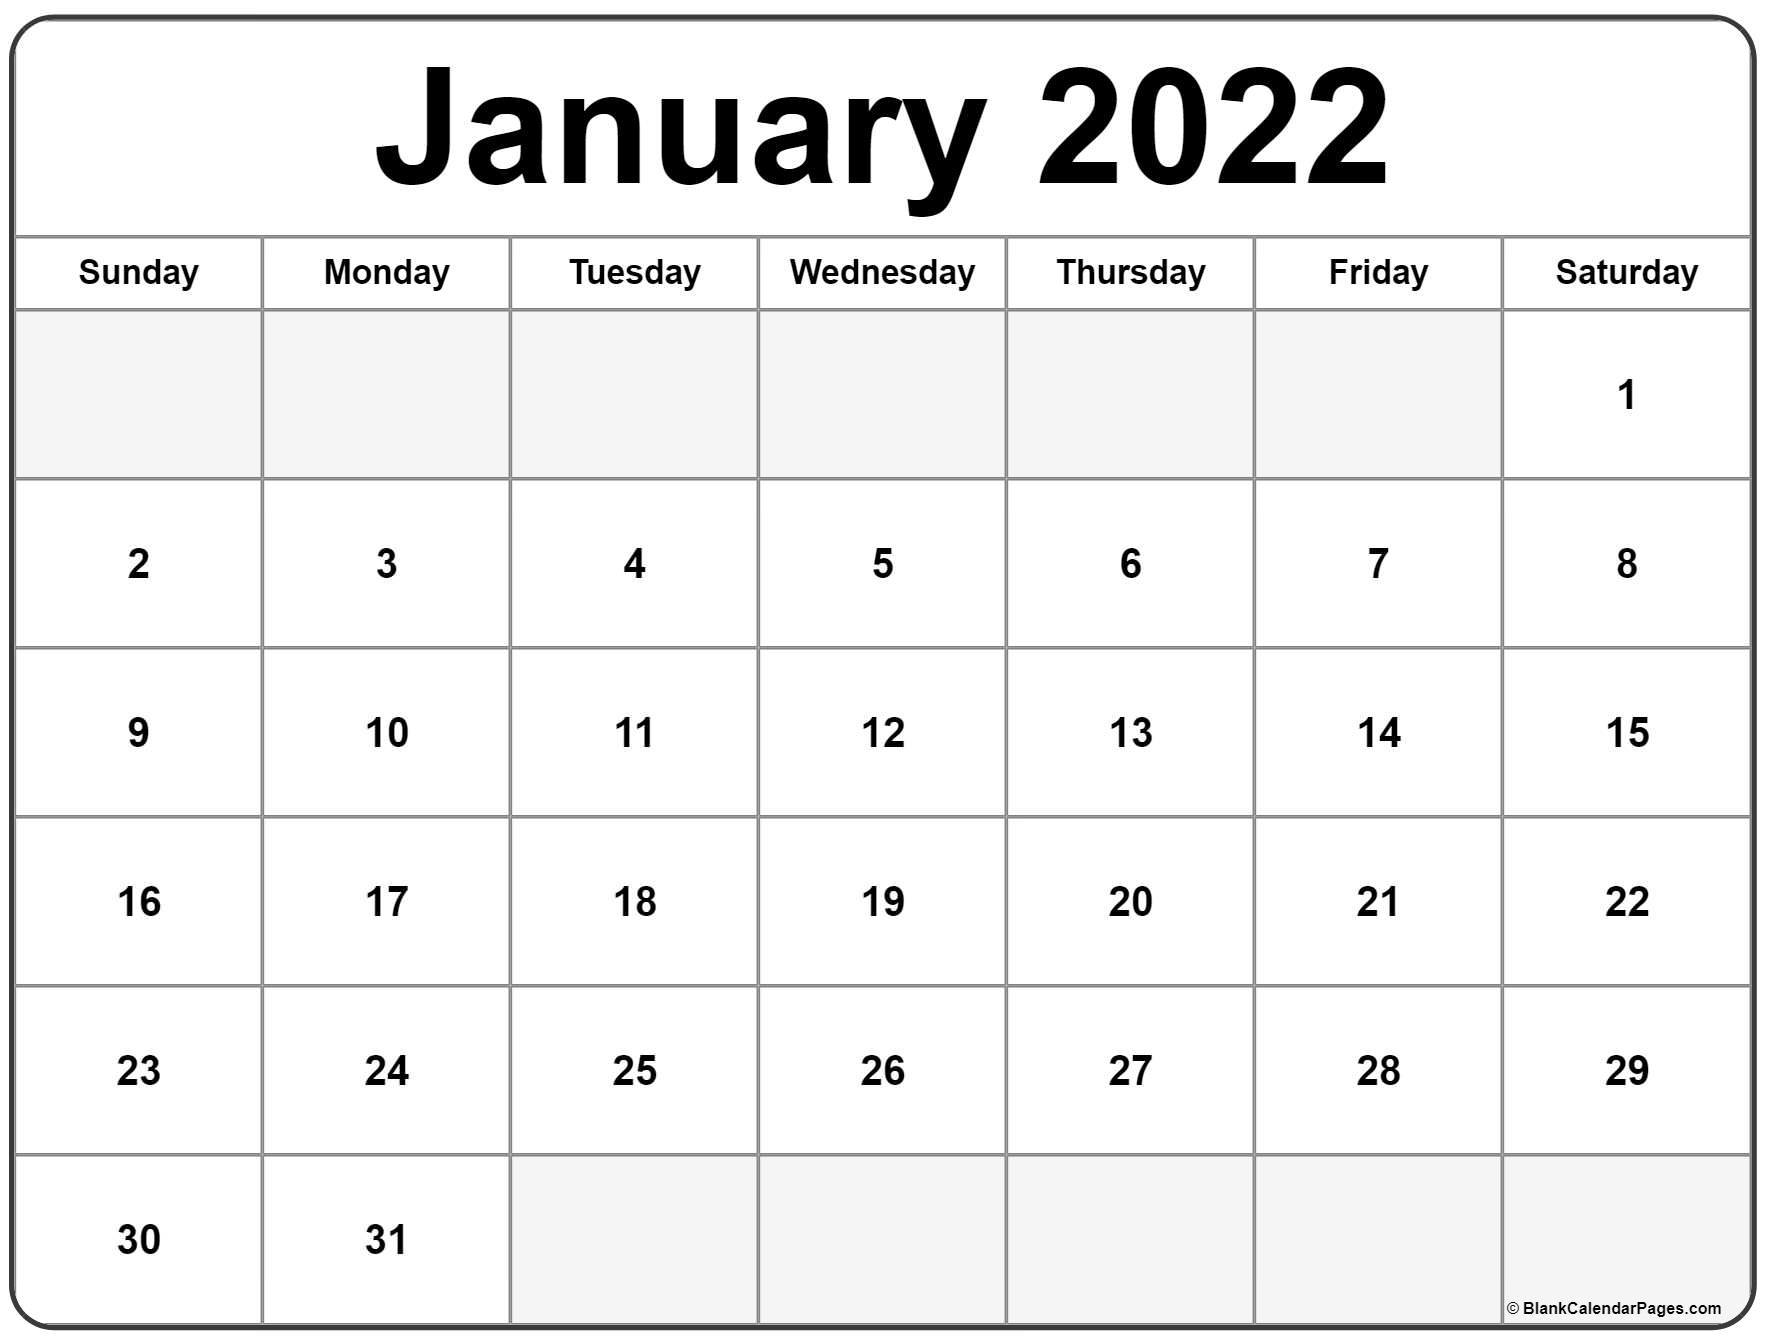 January 2022 Calendar Printable